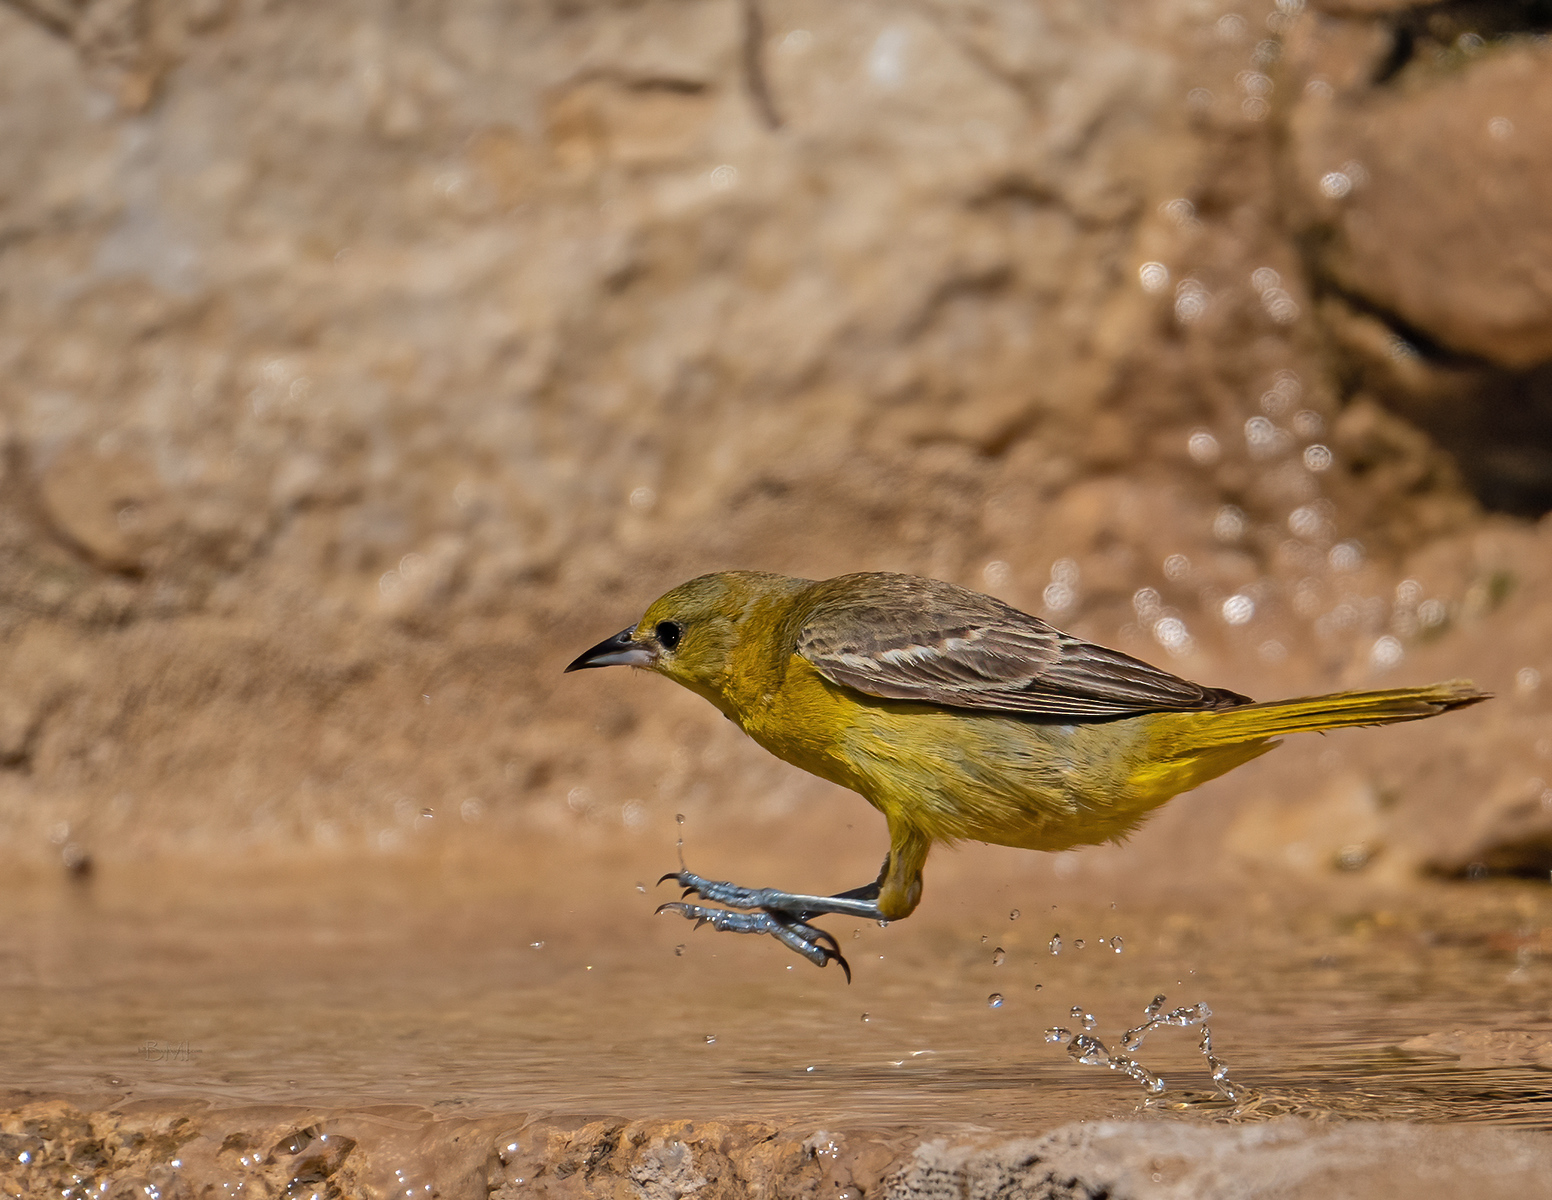 IMAGE: https://photos.smugmug.com/Beautyinthetreesandintheair/Birds/i-JvVvQrZ/0/0d8909ab/X3/Orchard%20oriole_9_6-2021-2-X3.jpg